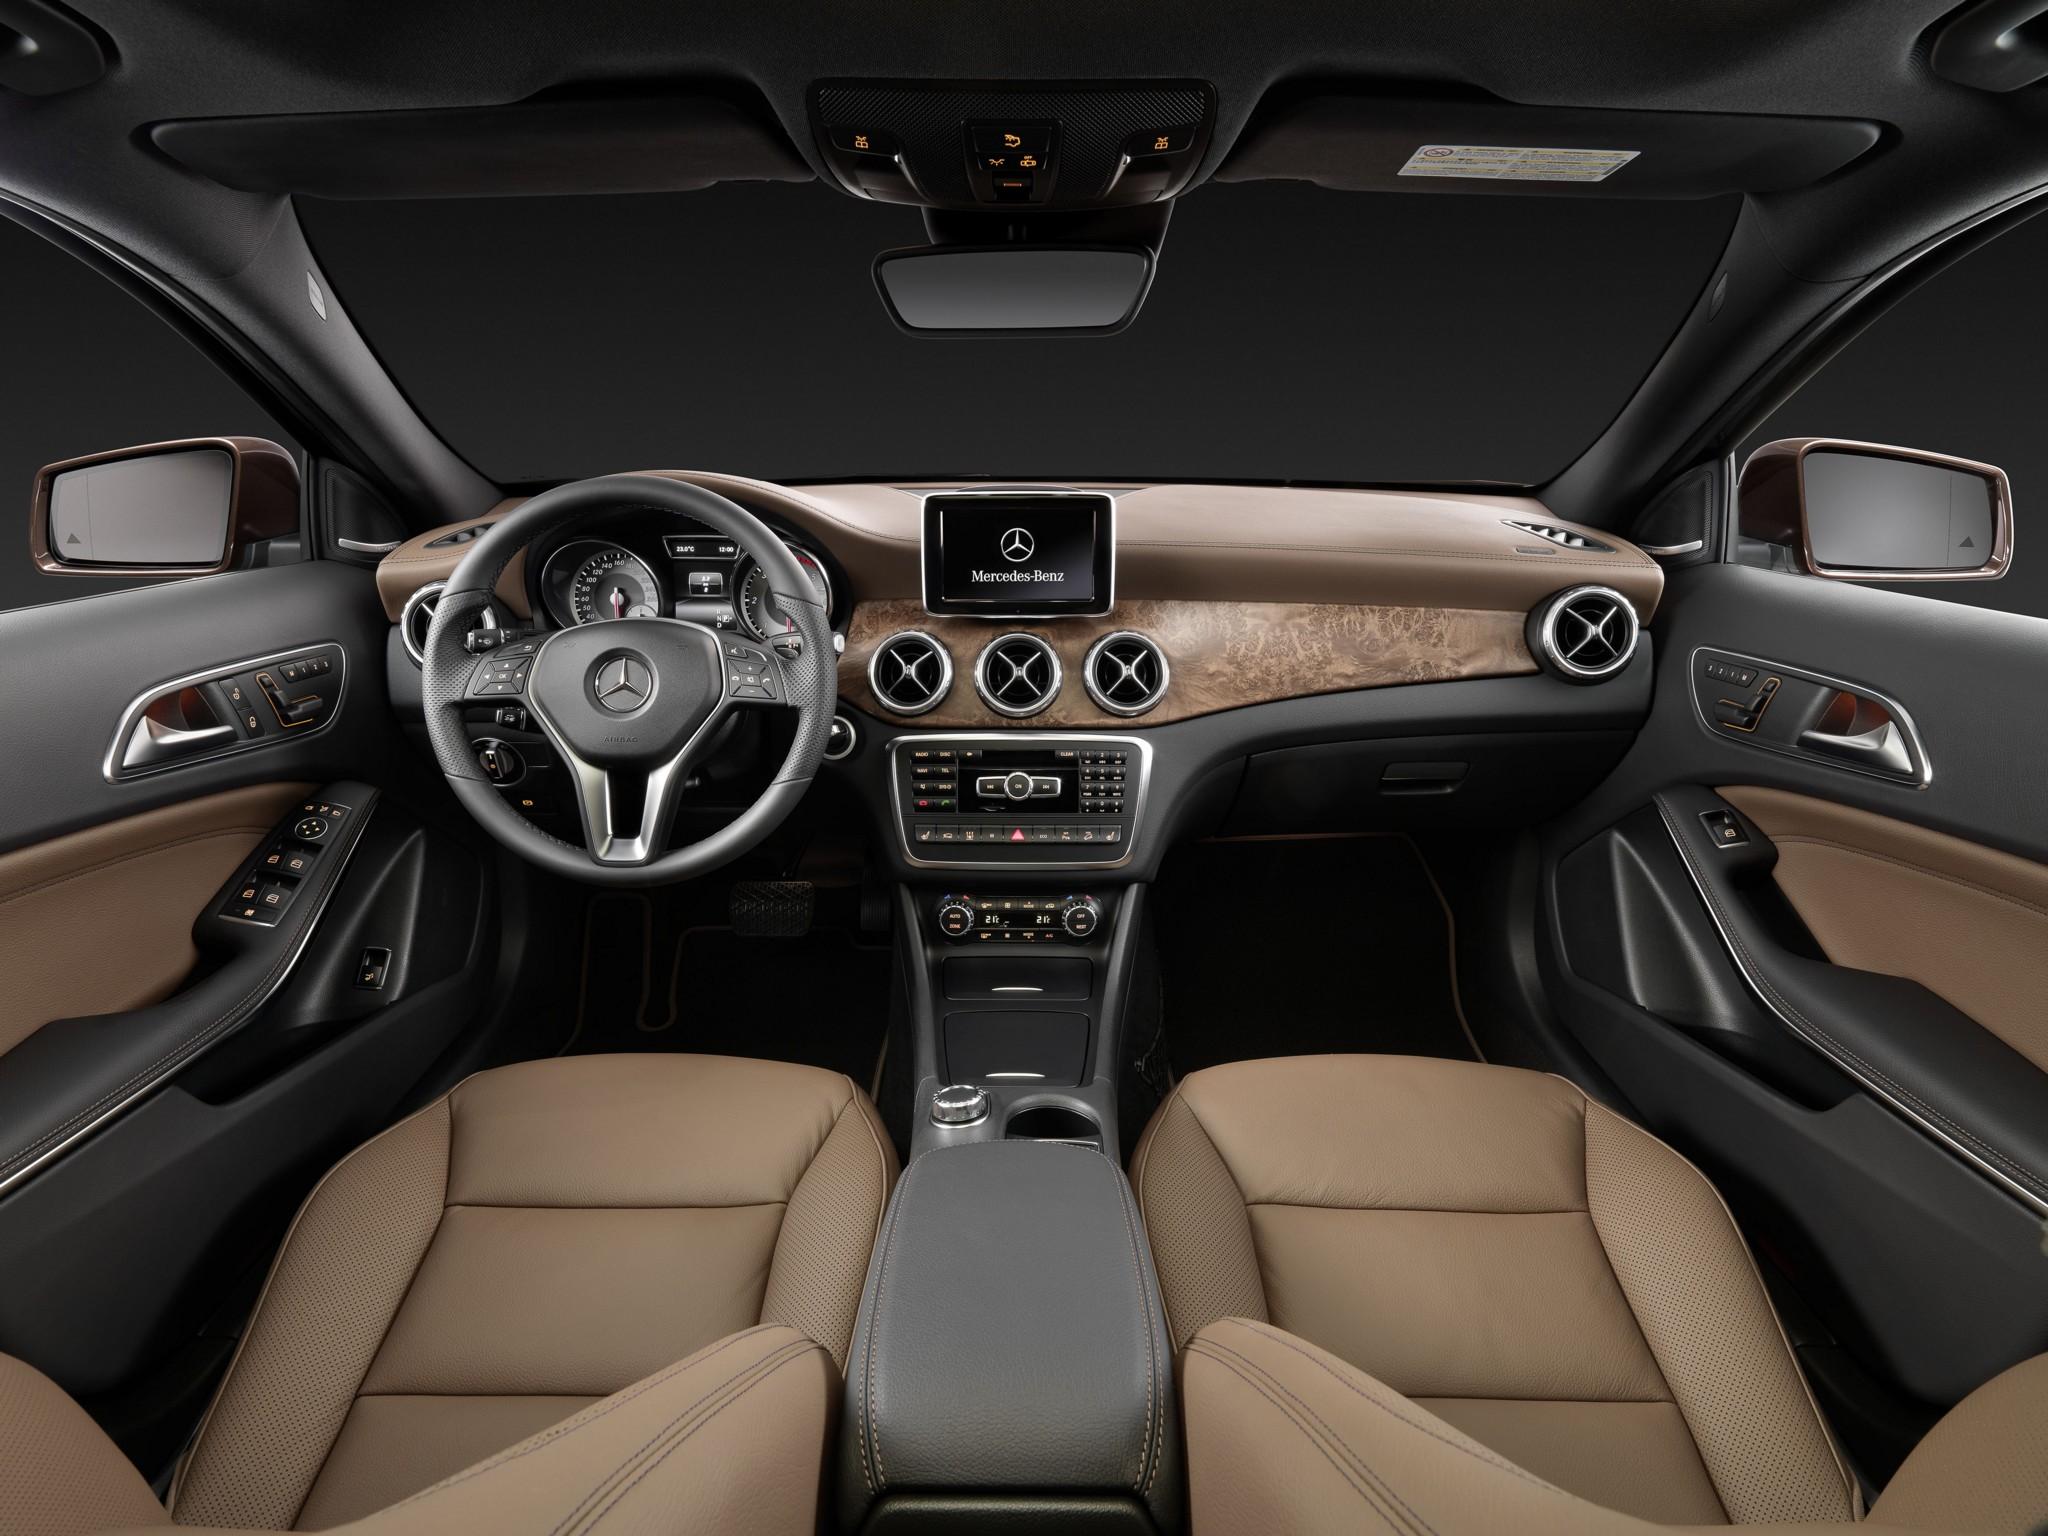 Mercedes Gla 220 Cdi Vs Volvo V40 Cross Country D4 The